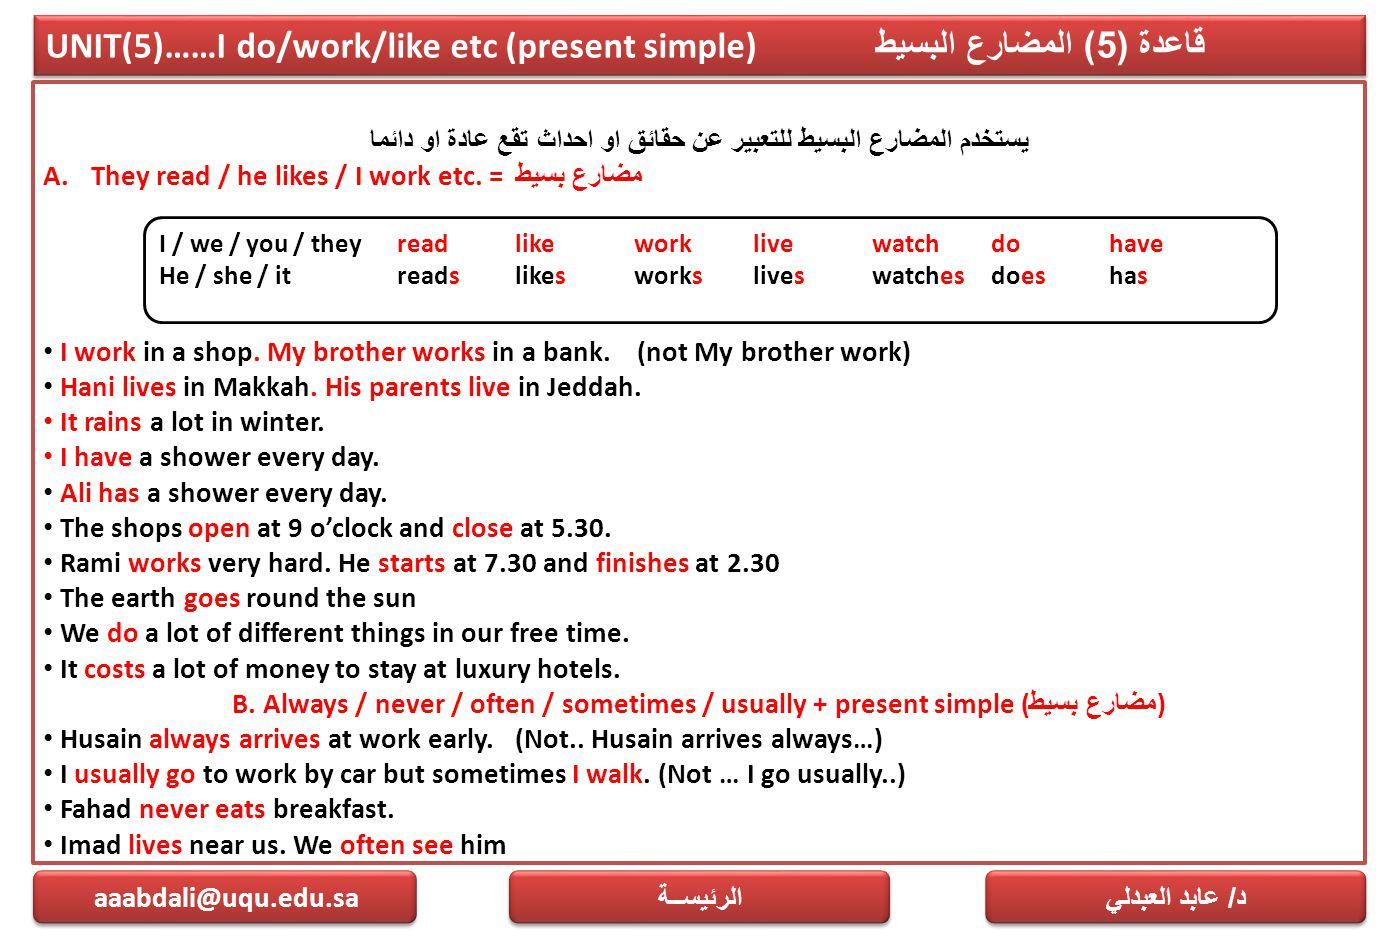 UNIT(5)……I do/work/like etc (present simple) قاعدة (5) المضارع البسيط